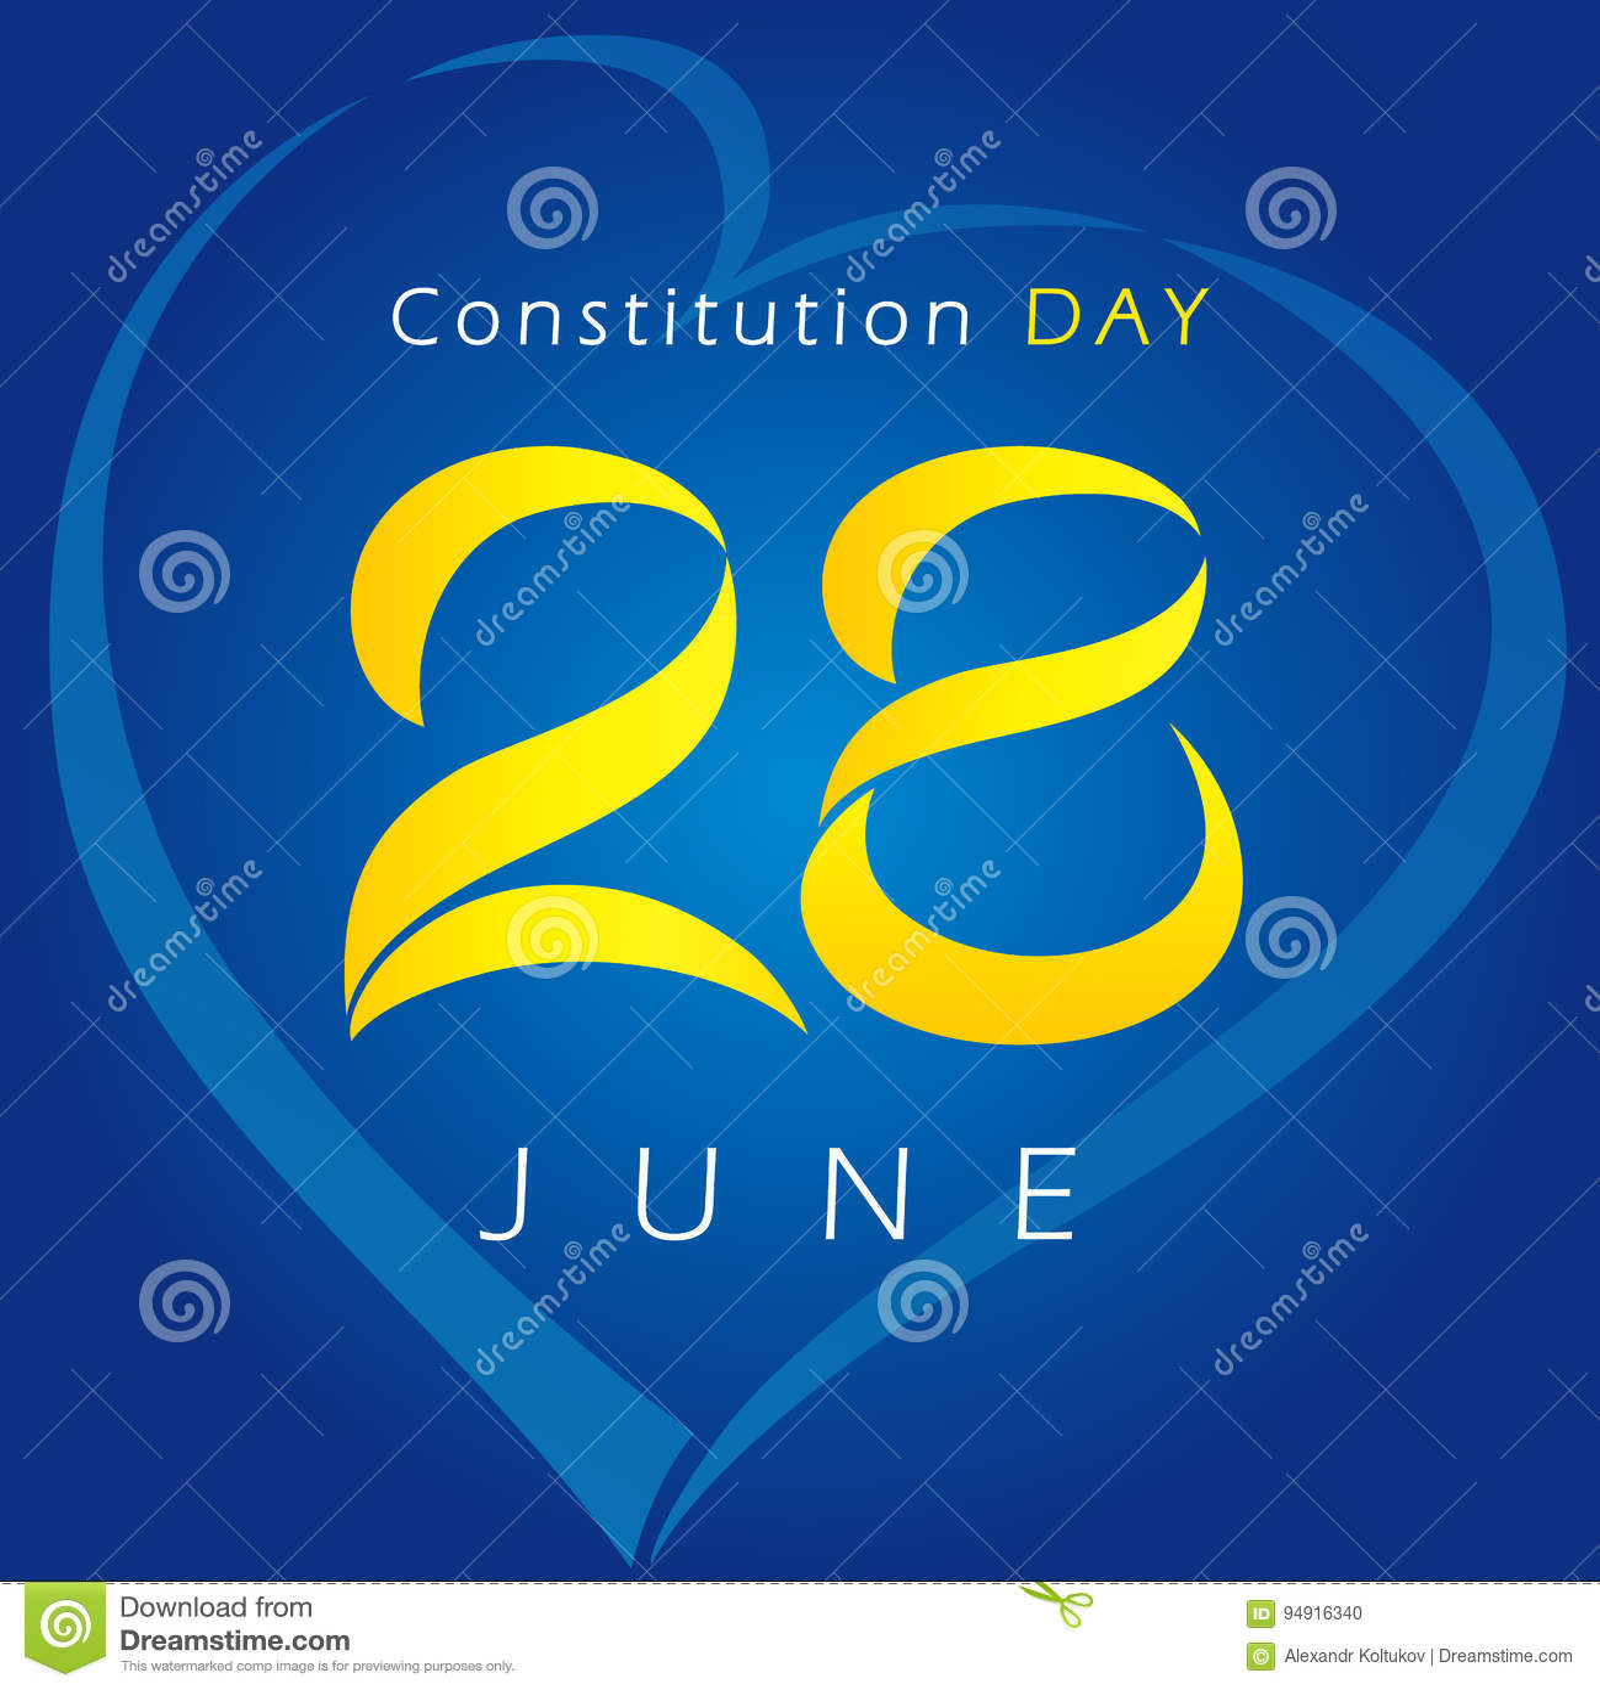 Ukrainian Constitution Day Vector Greetings Stock Vector